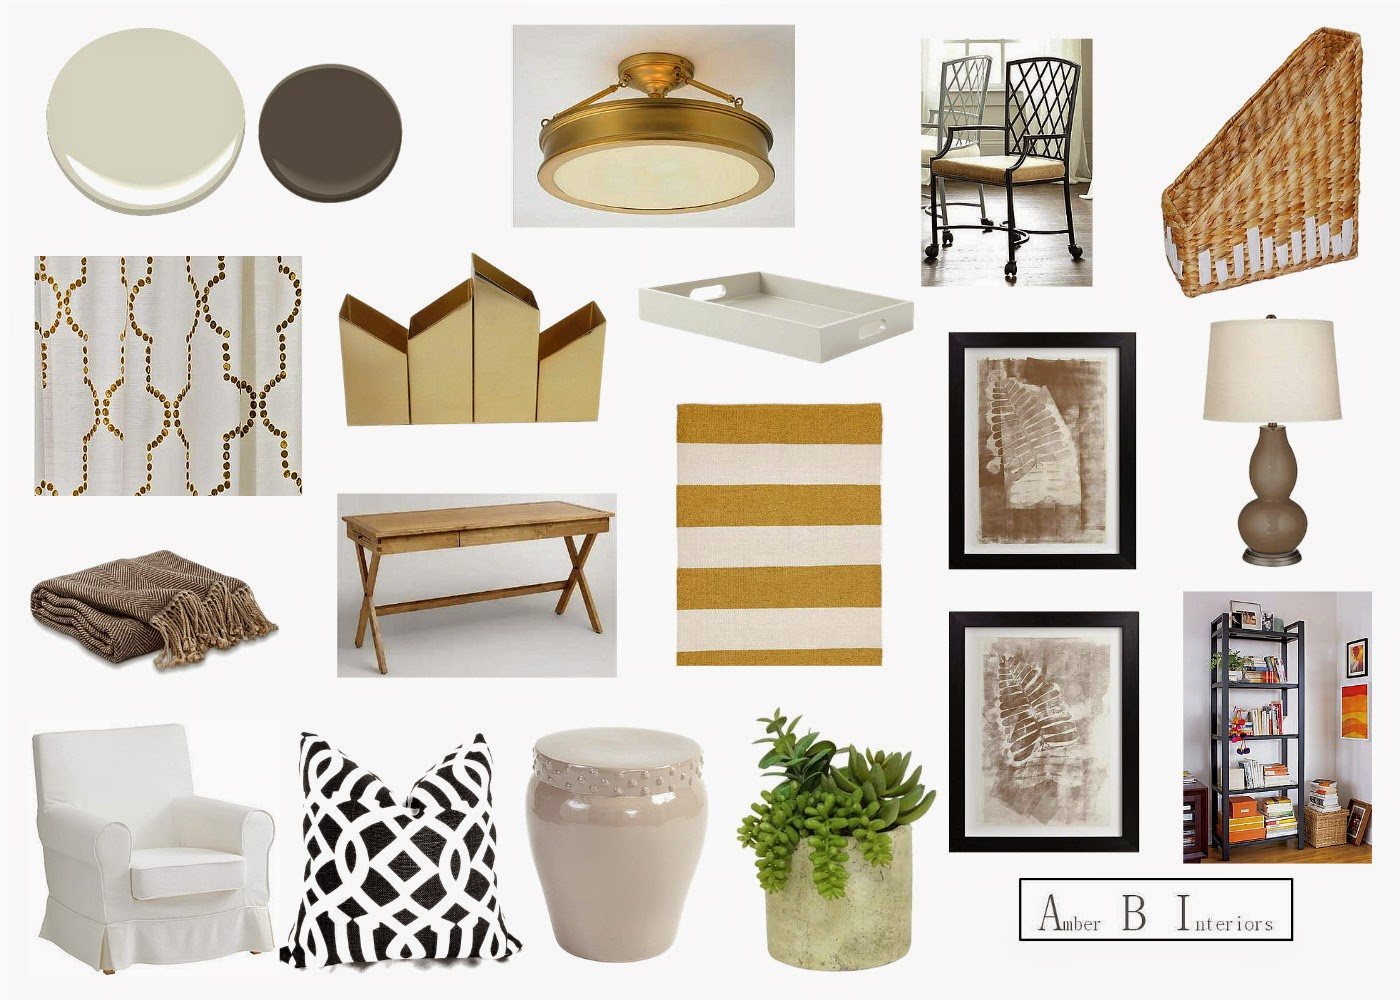 Amber B Design Studio